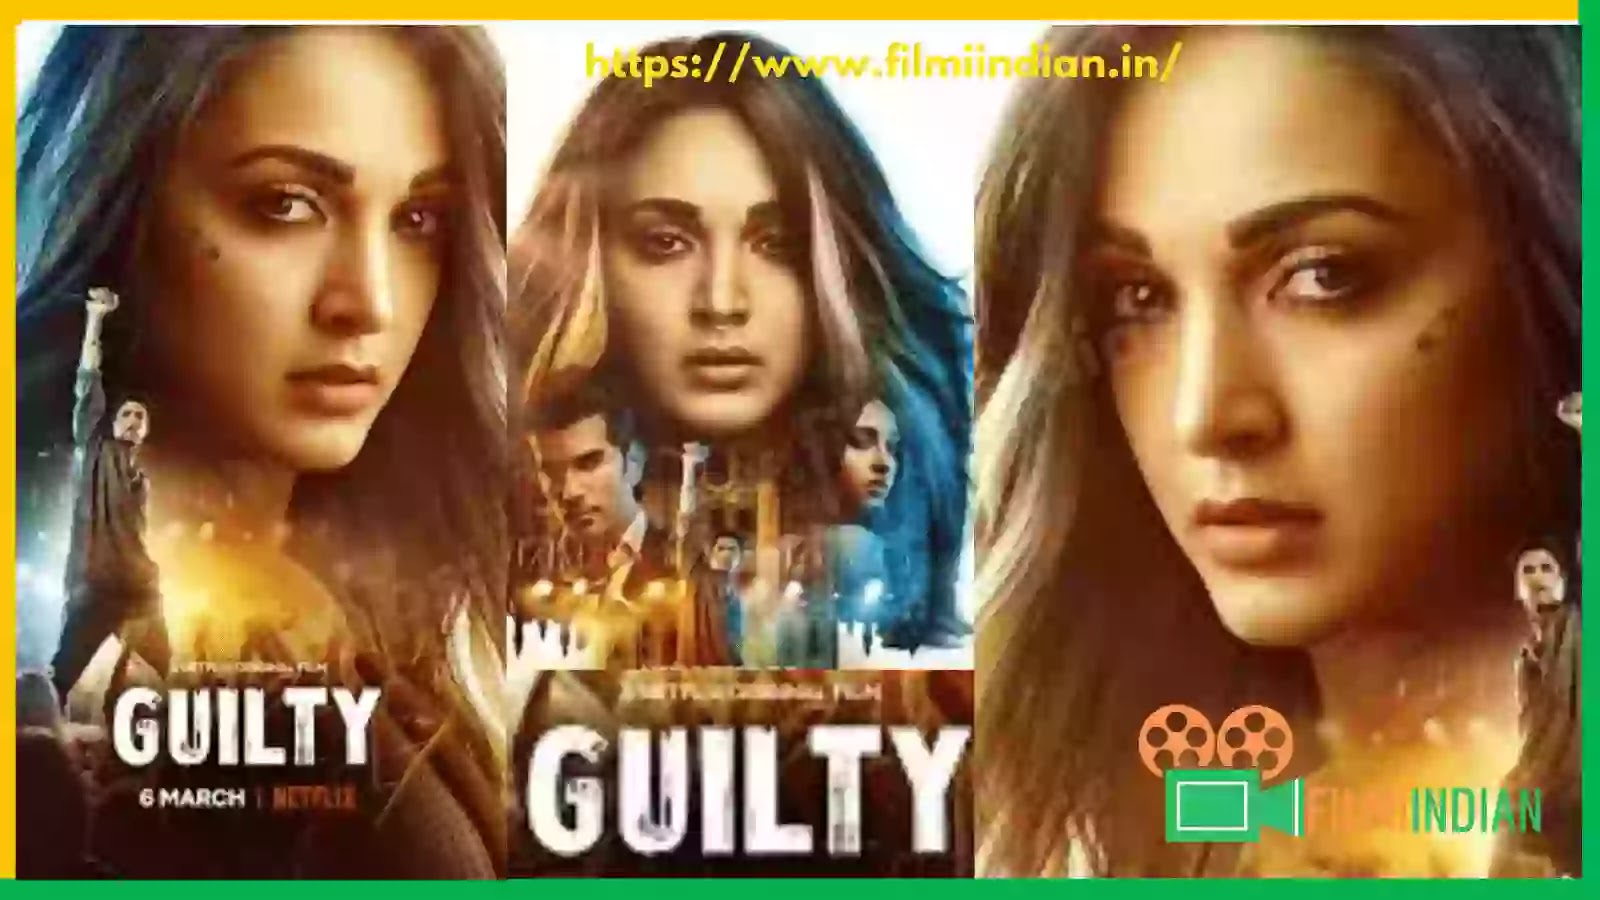 Guilty : (2020) : Netflix : Best and Honest Review